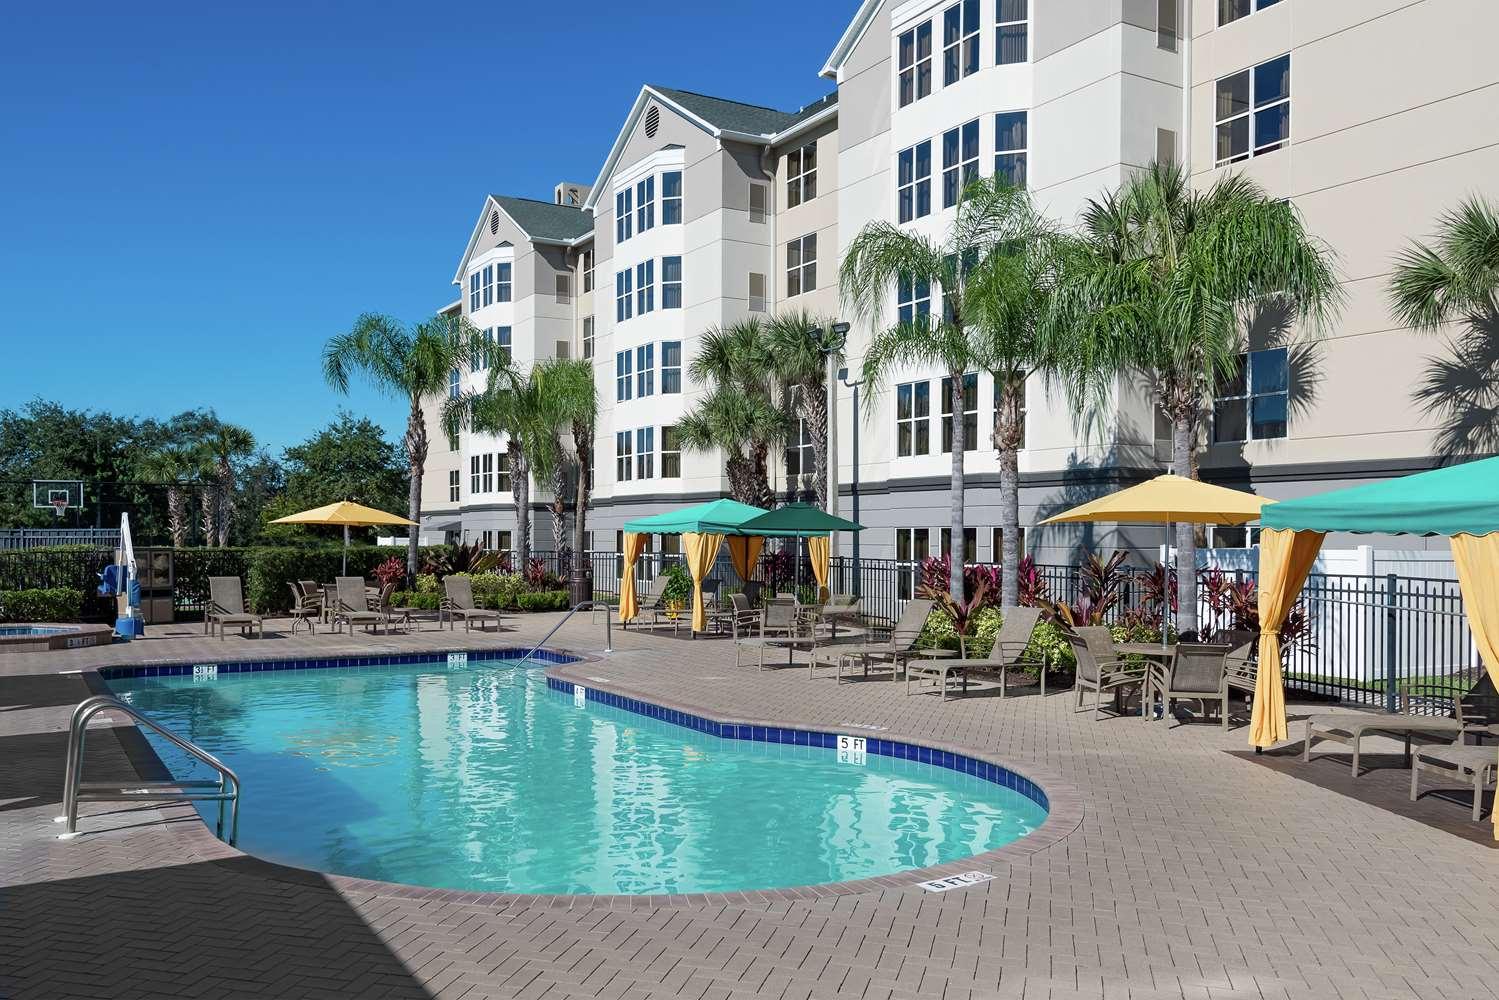 Pool - Homewood Suites by Hilton Universal Studios Orlando